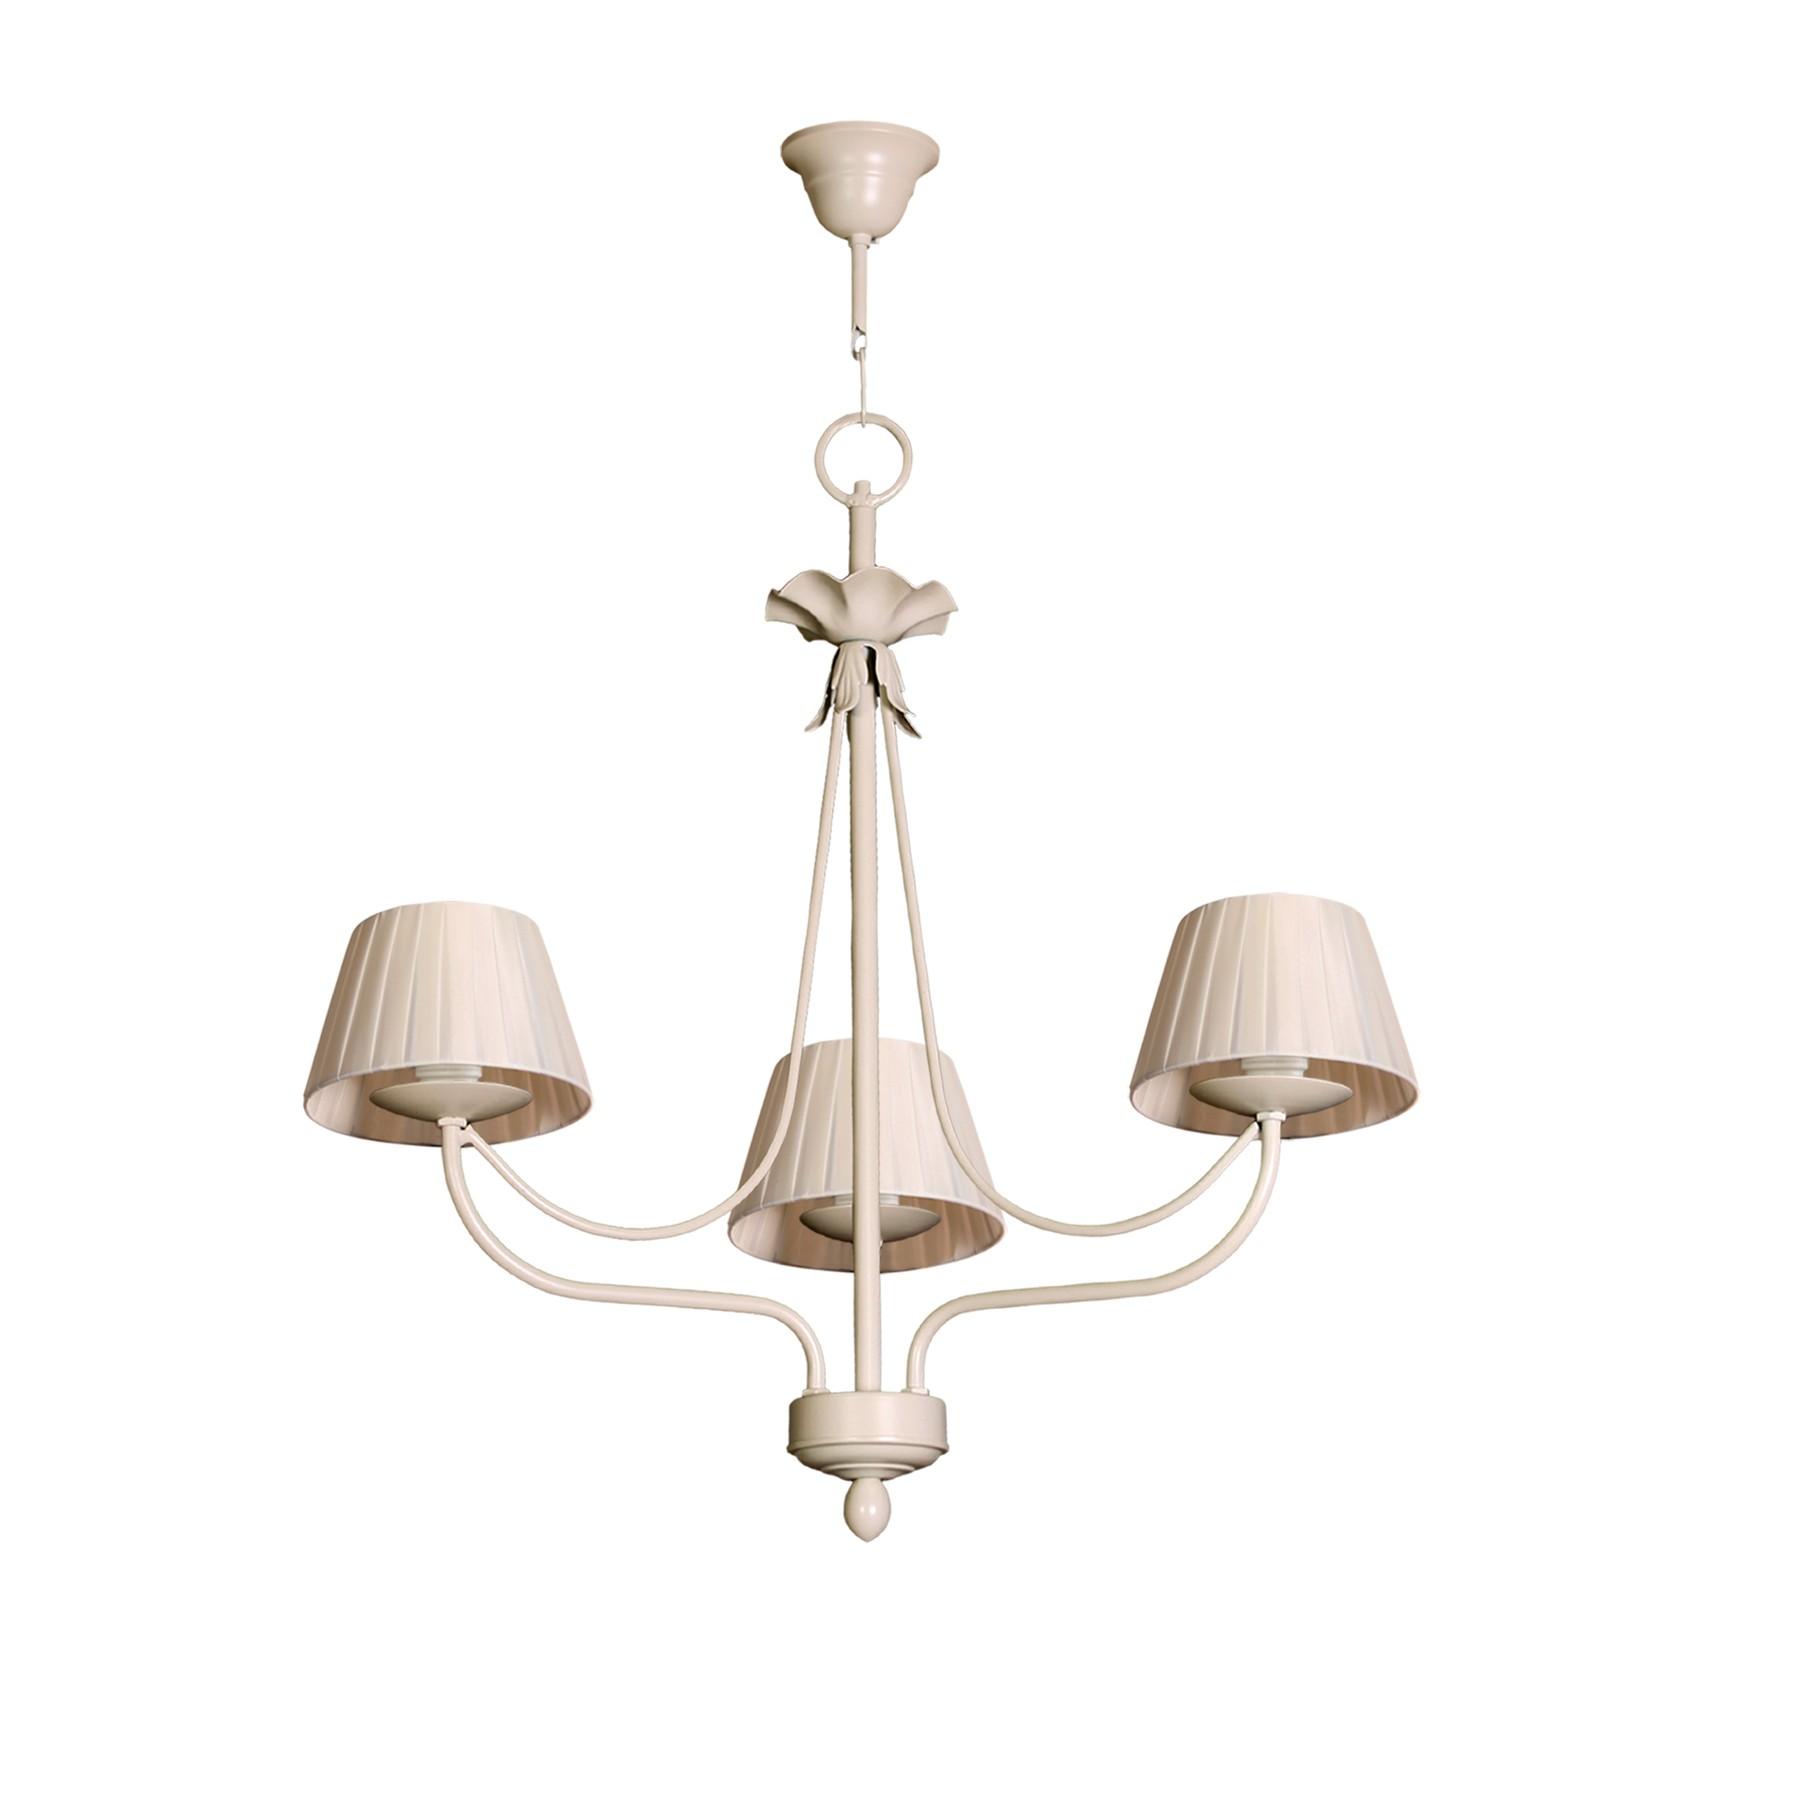 L mpara de techo cl sica modelo min de tres l mparas for Modelos de lamparas